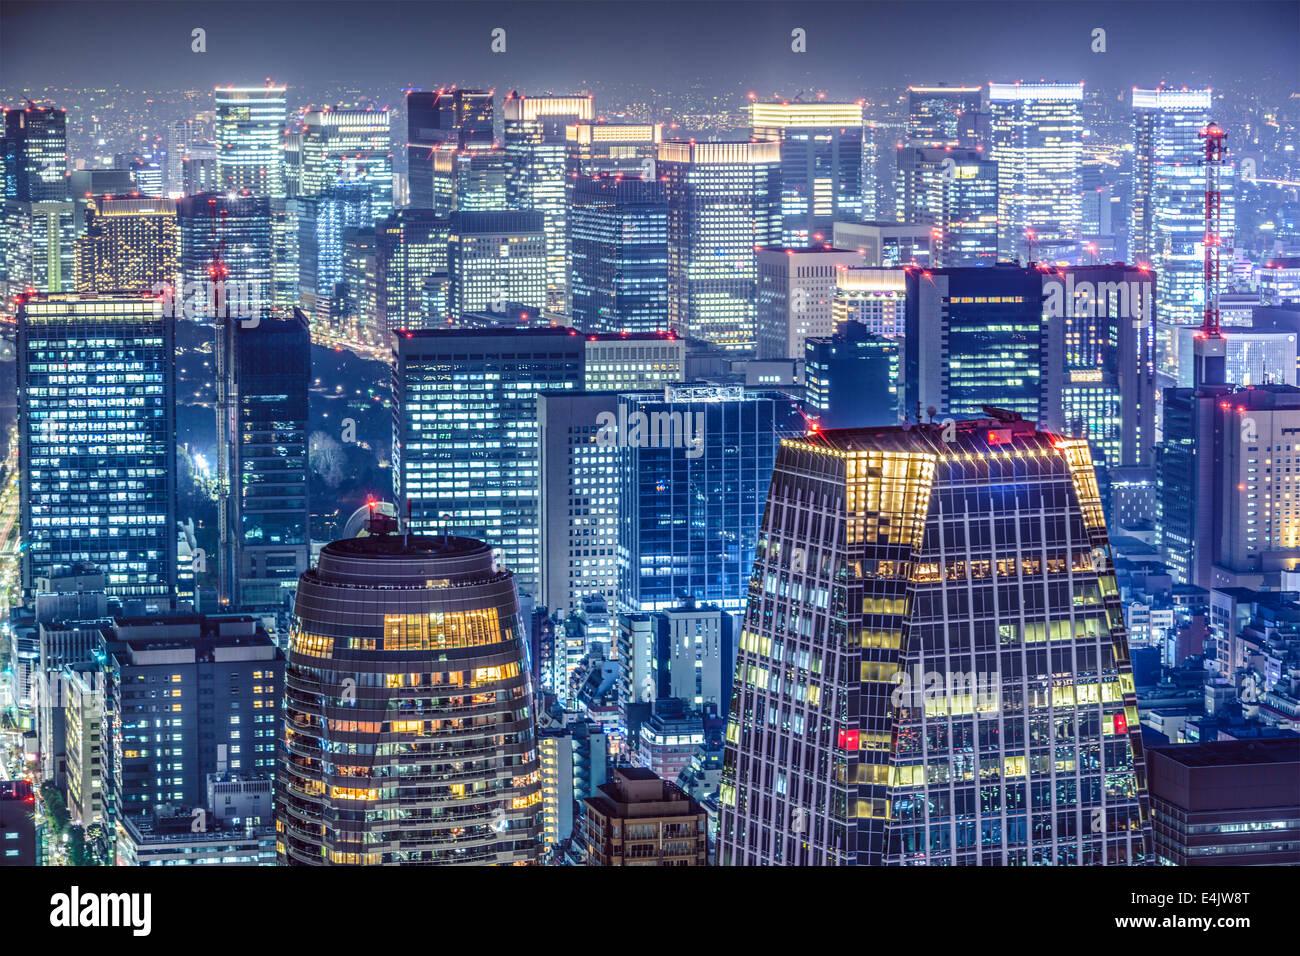 Tokyo, Japan dense city skyline. - Stock Image